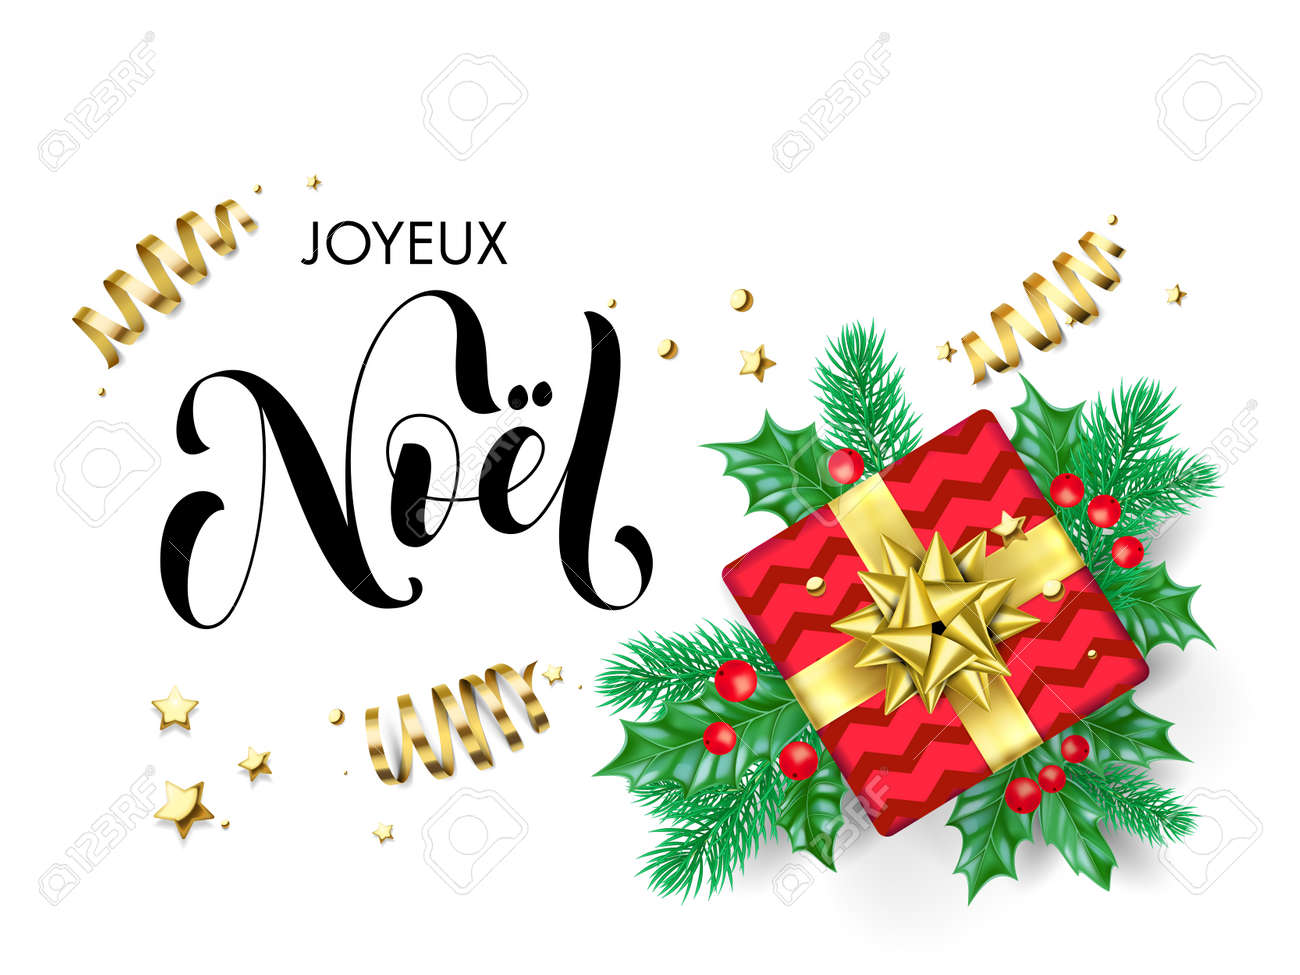 Joyeux Noel Clipart.Joyeux Noel Merry Christmas Frenchtrendy Quote Calligraphy On